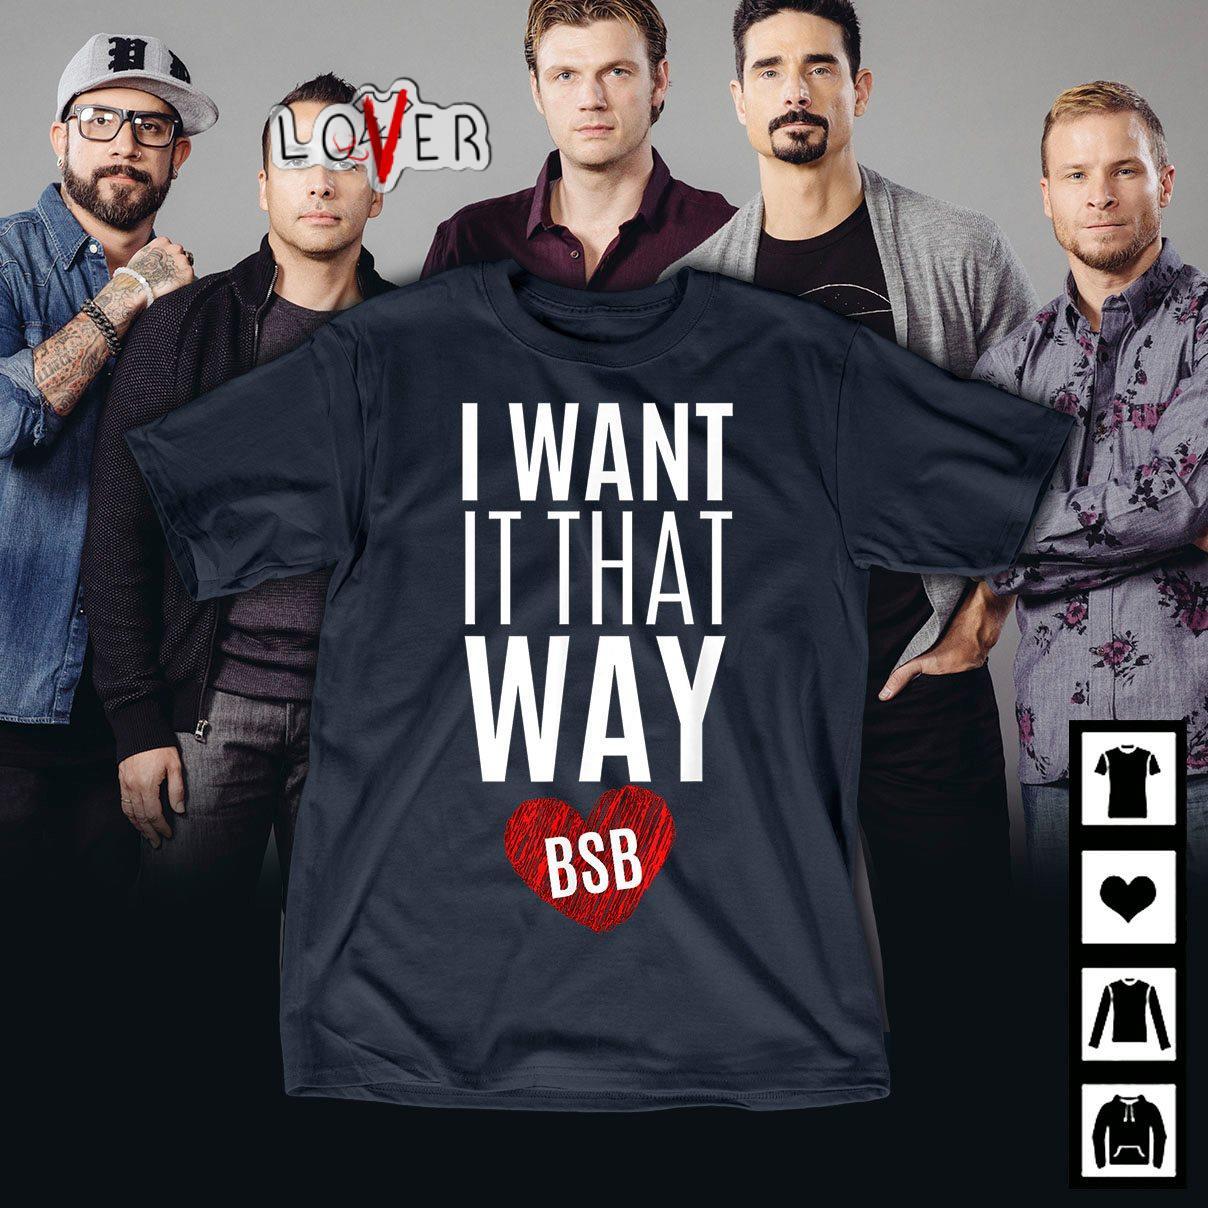 Backstreet Boys I want It that way BSB shirt